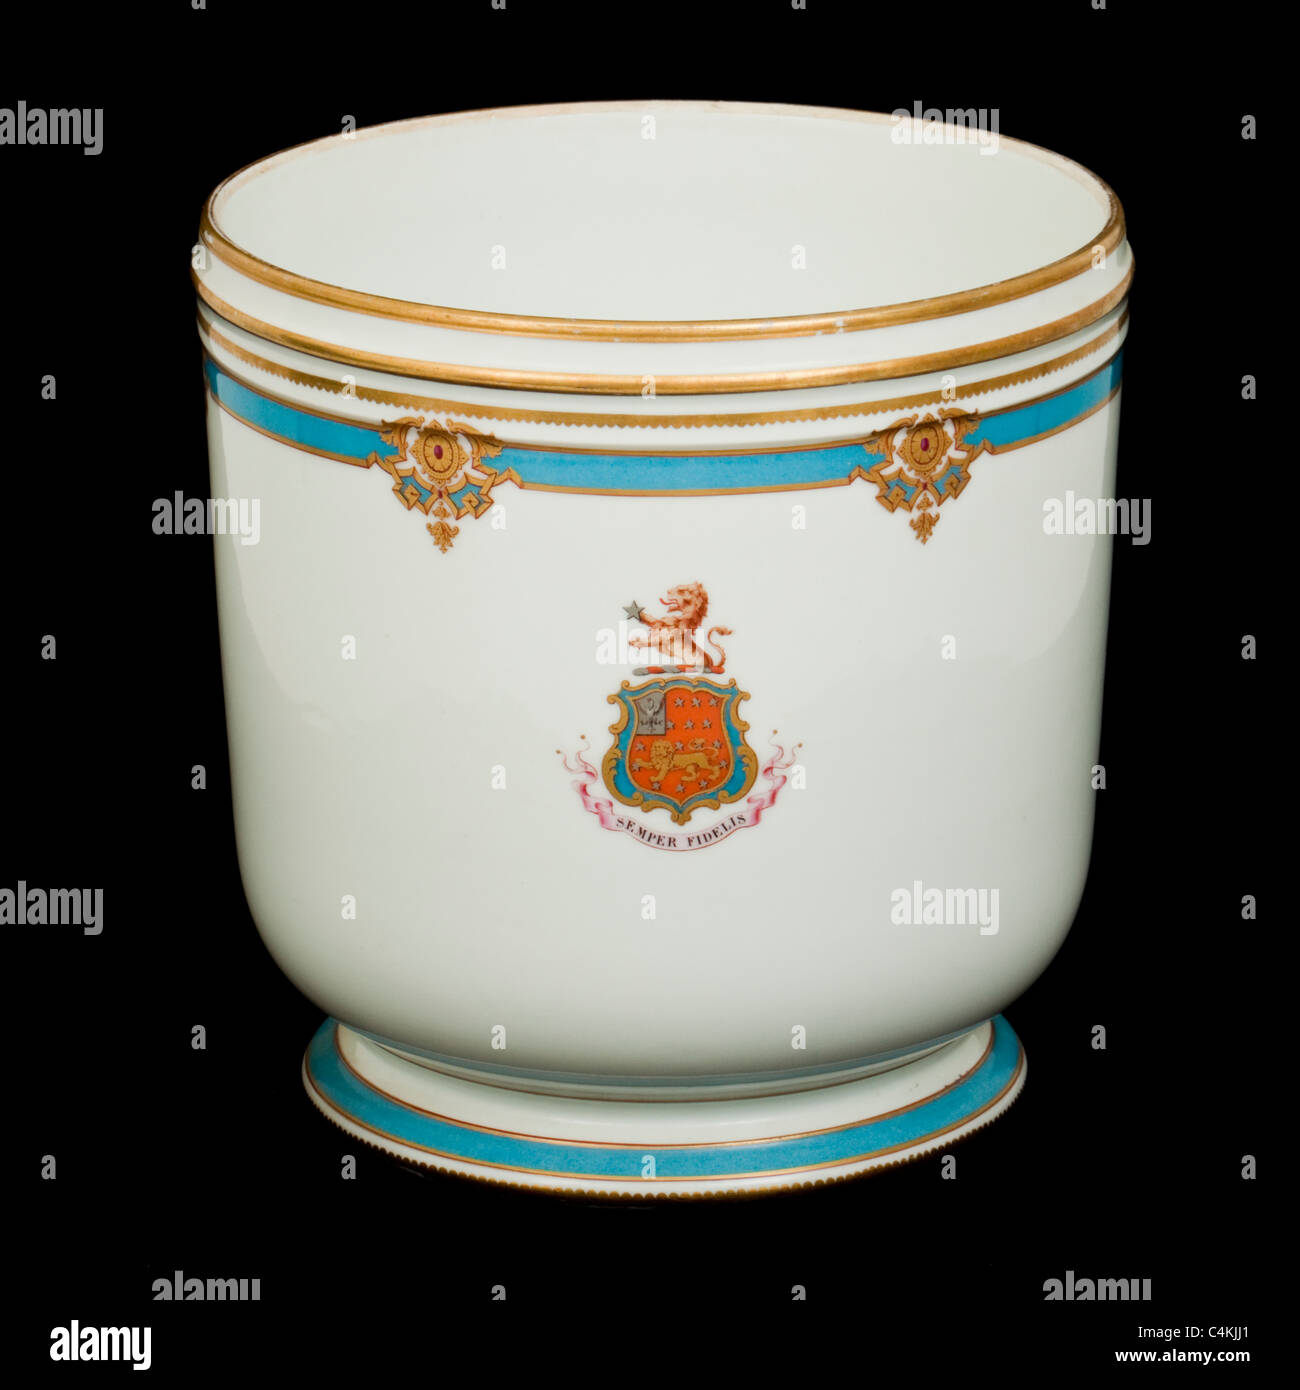 "Antique French ceramic Jardiniere with ""Semper Fidelis"" (Always Faithful) motto Stock Photo"